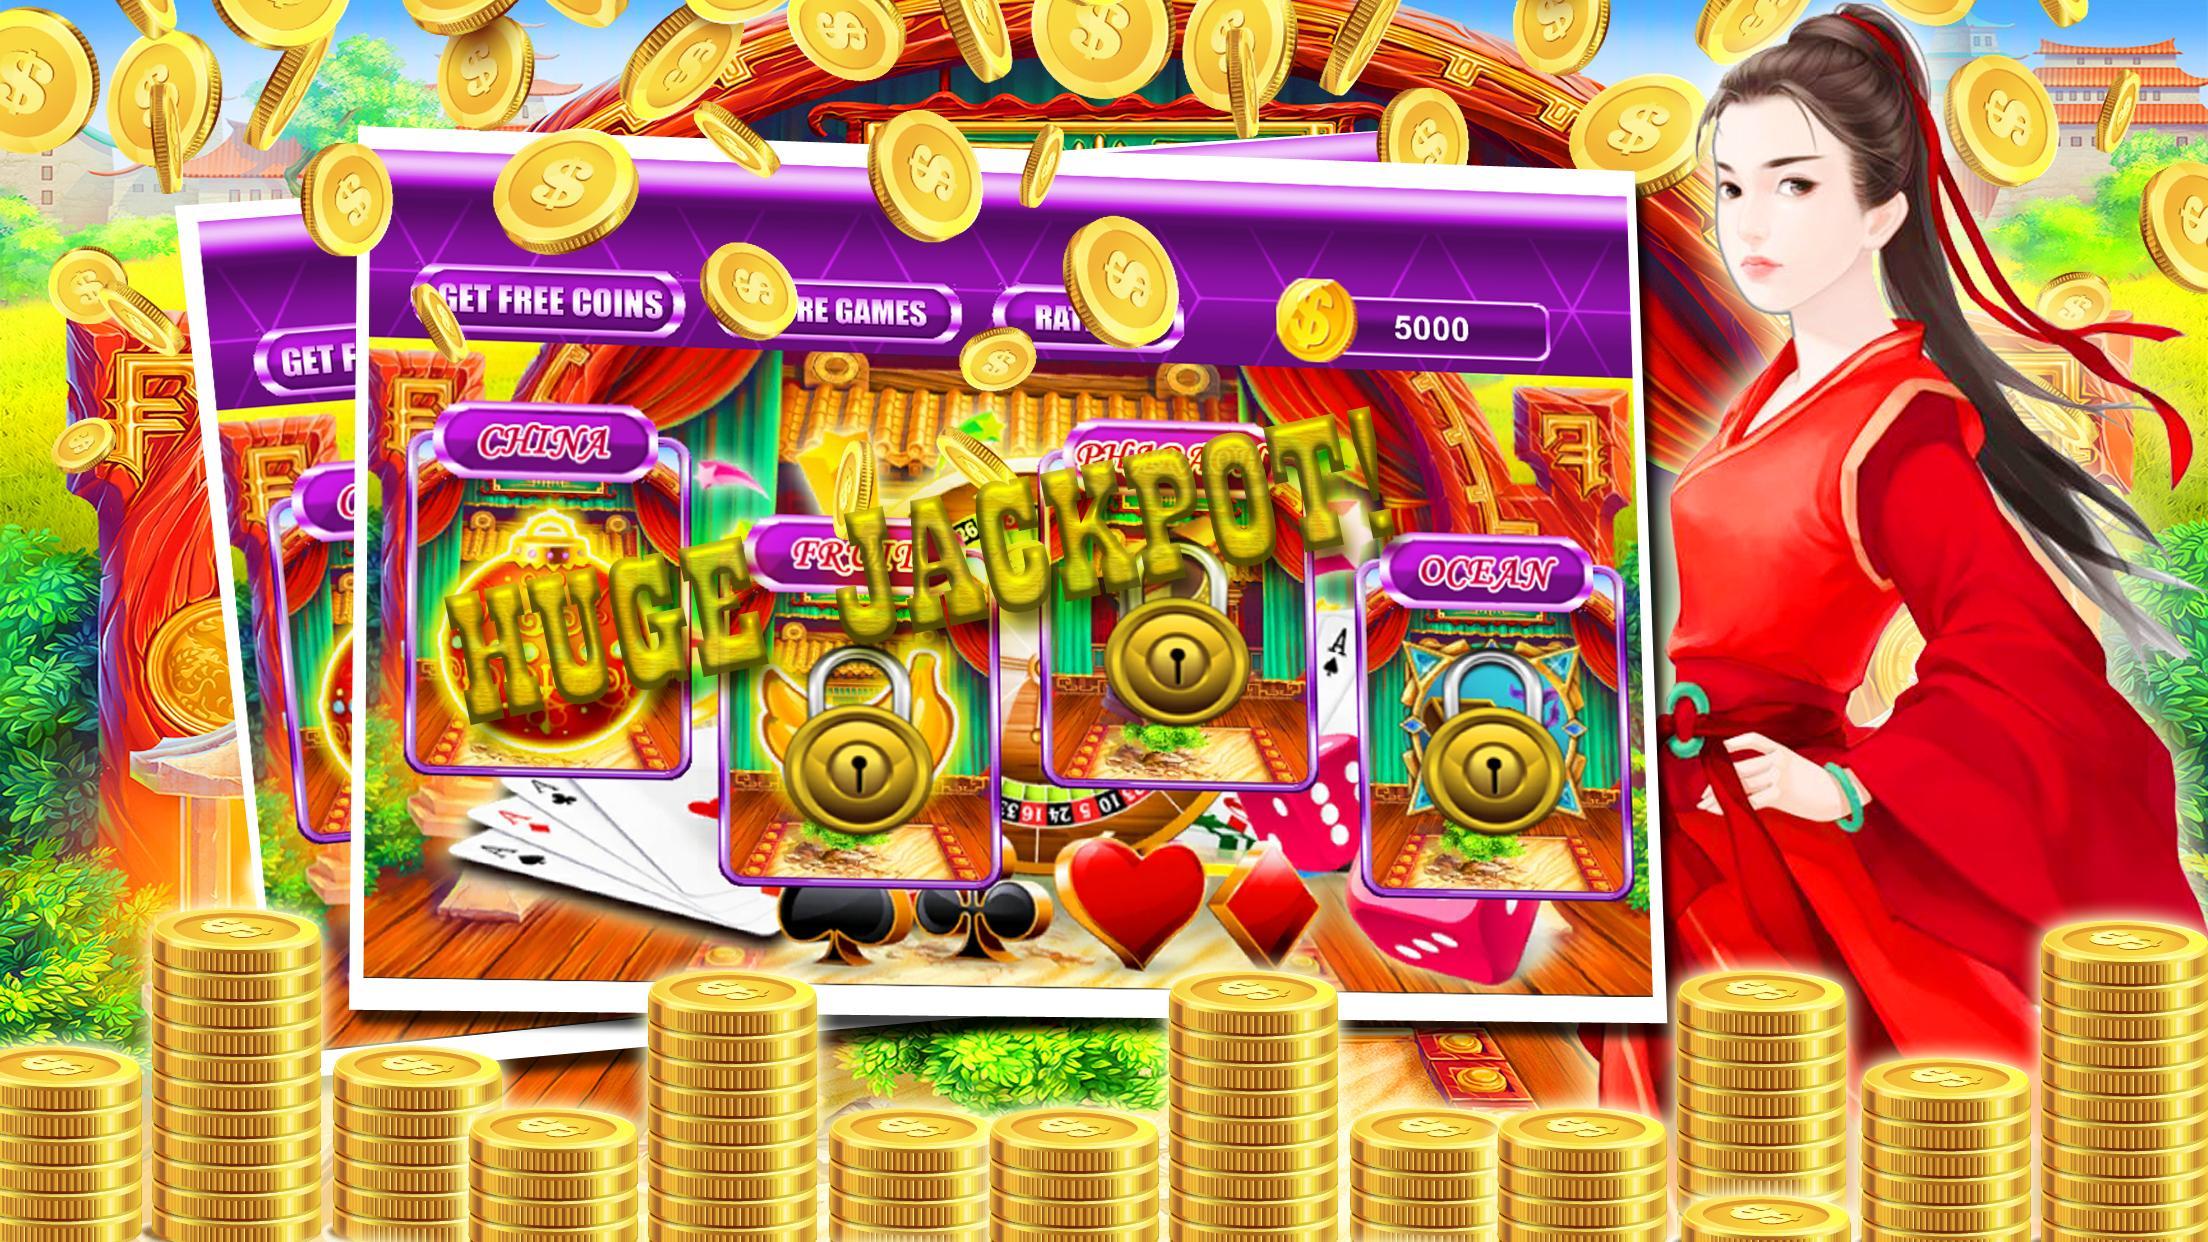 Gold coast casino and hotel las vegas